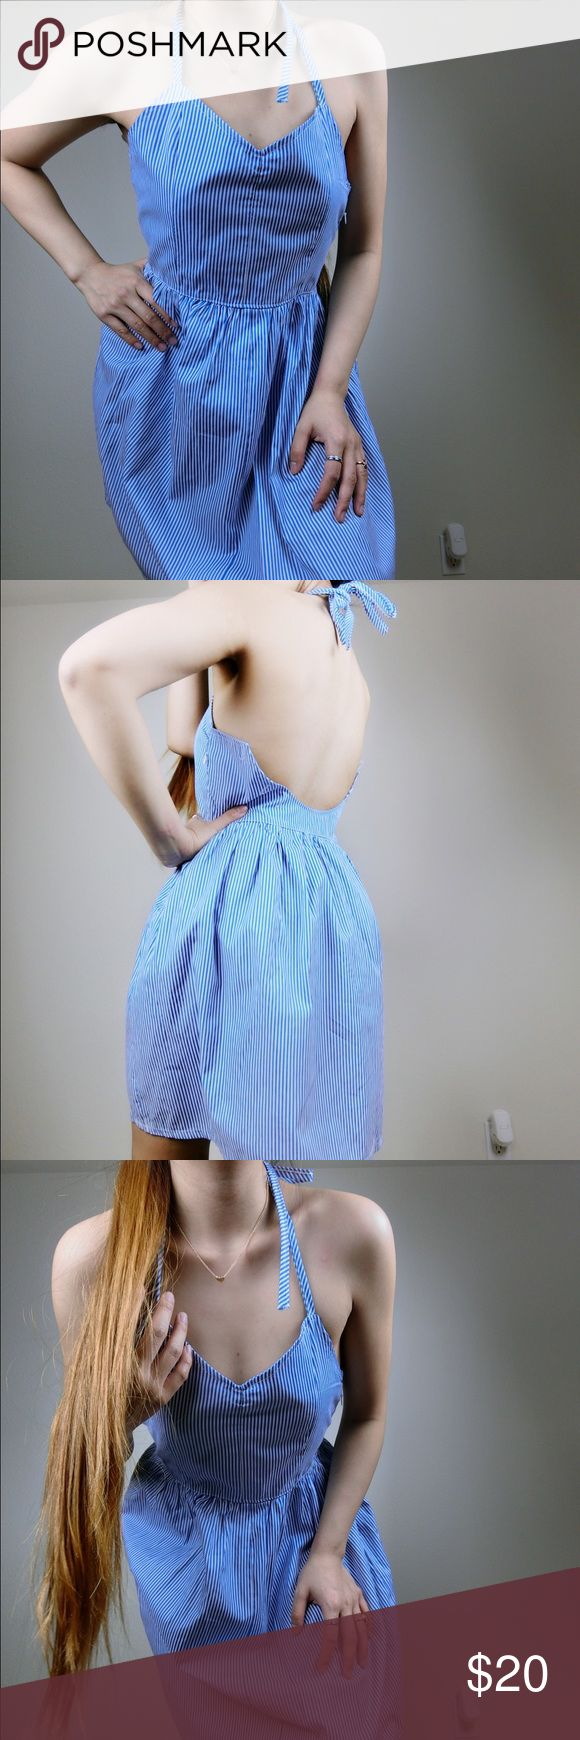 🌸NWOT blue and white long striped dress 🌸 Dresses Midi